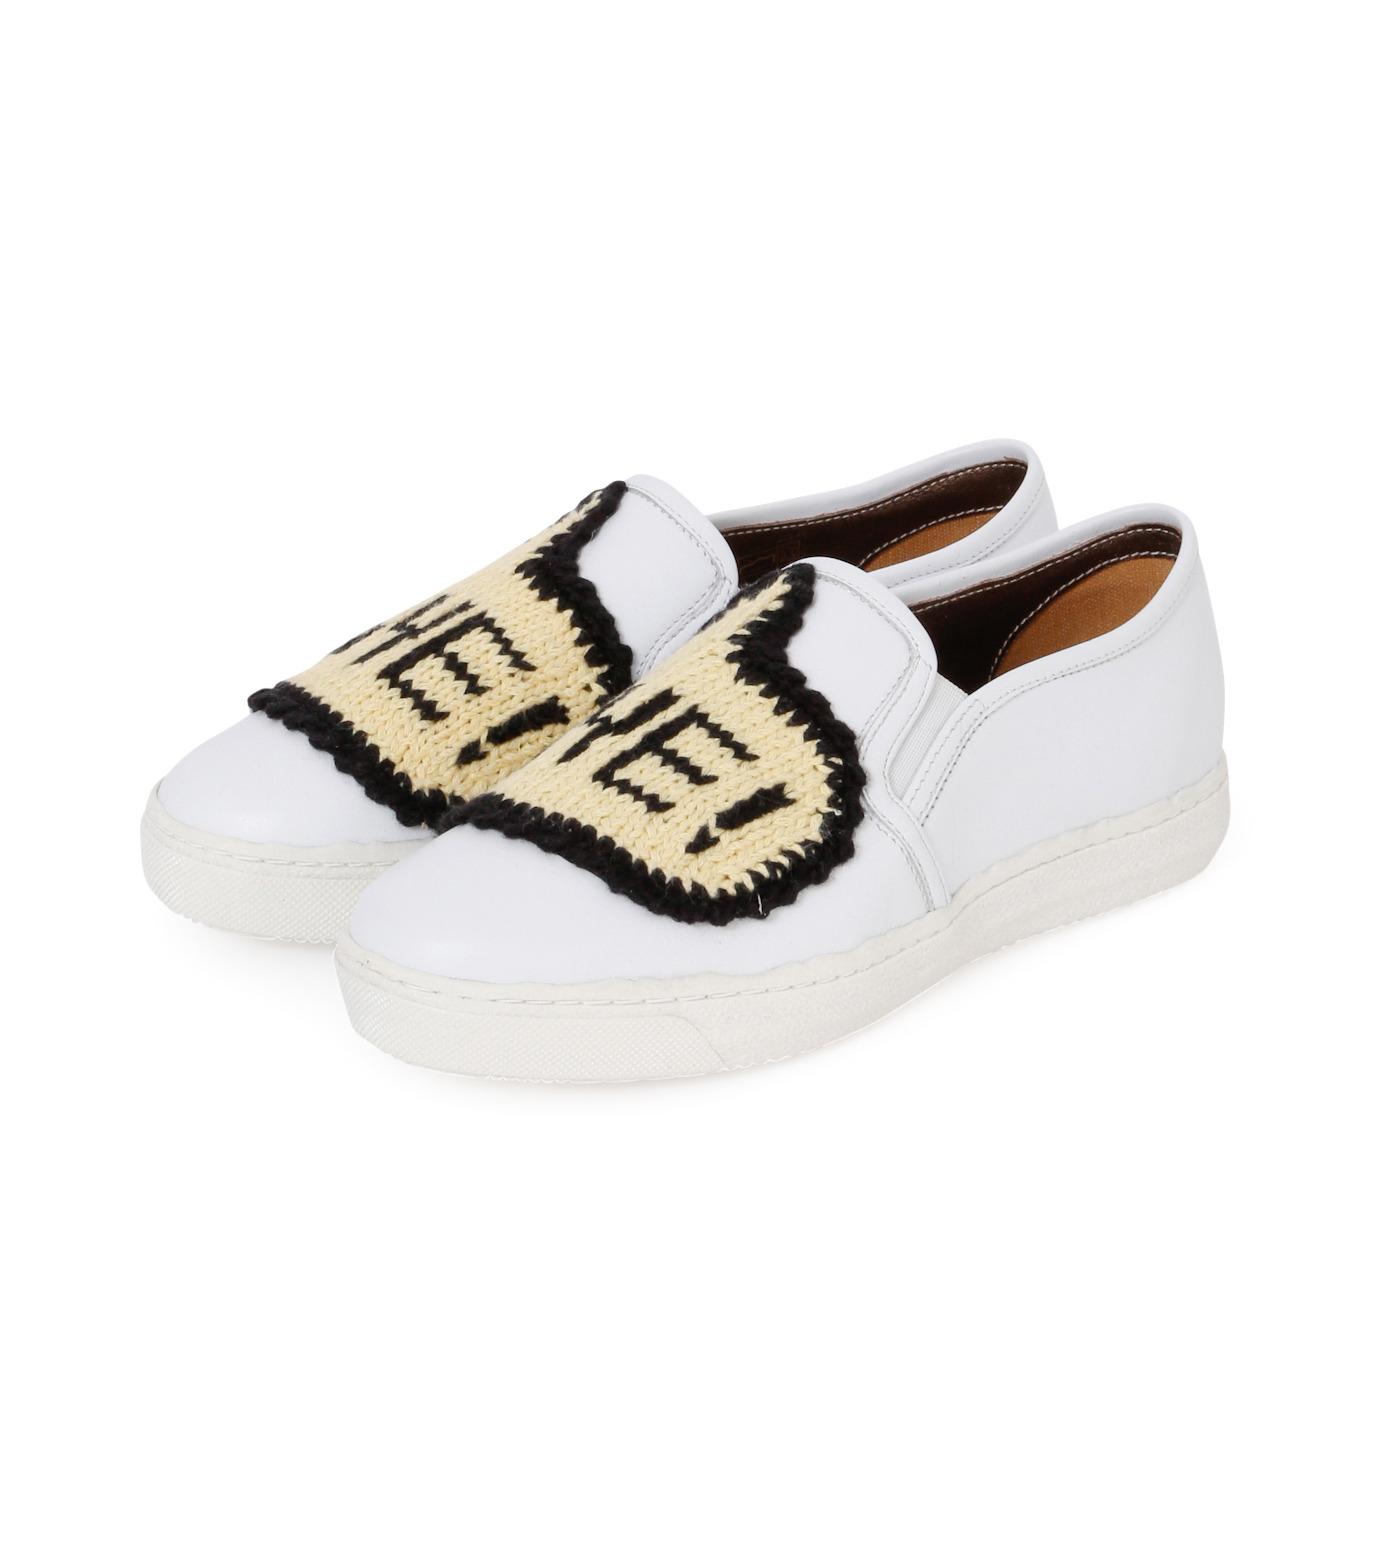 Michaela Buerger(ミカエラ バーガー)のSneaker Bye Bye-WHITE(スニーカー/sneaker)-BYEBYE-4 拡大詳細画像2